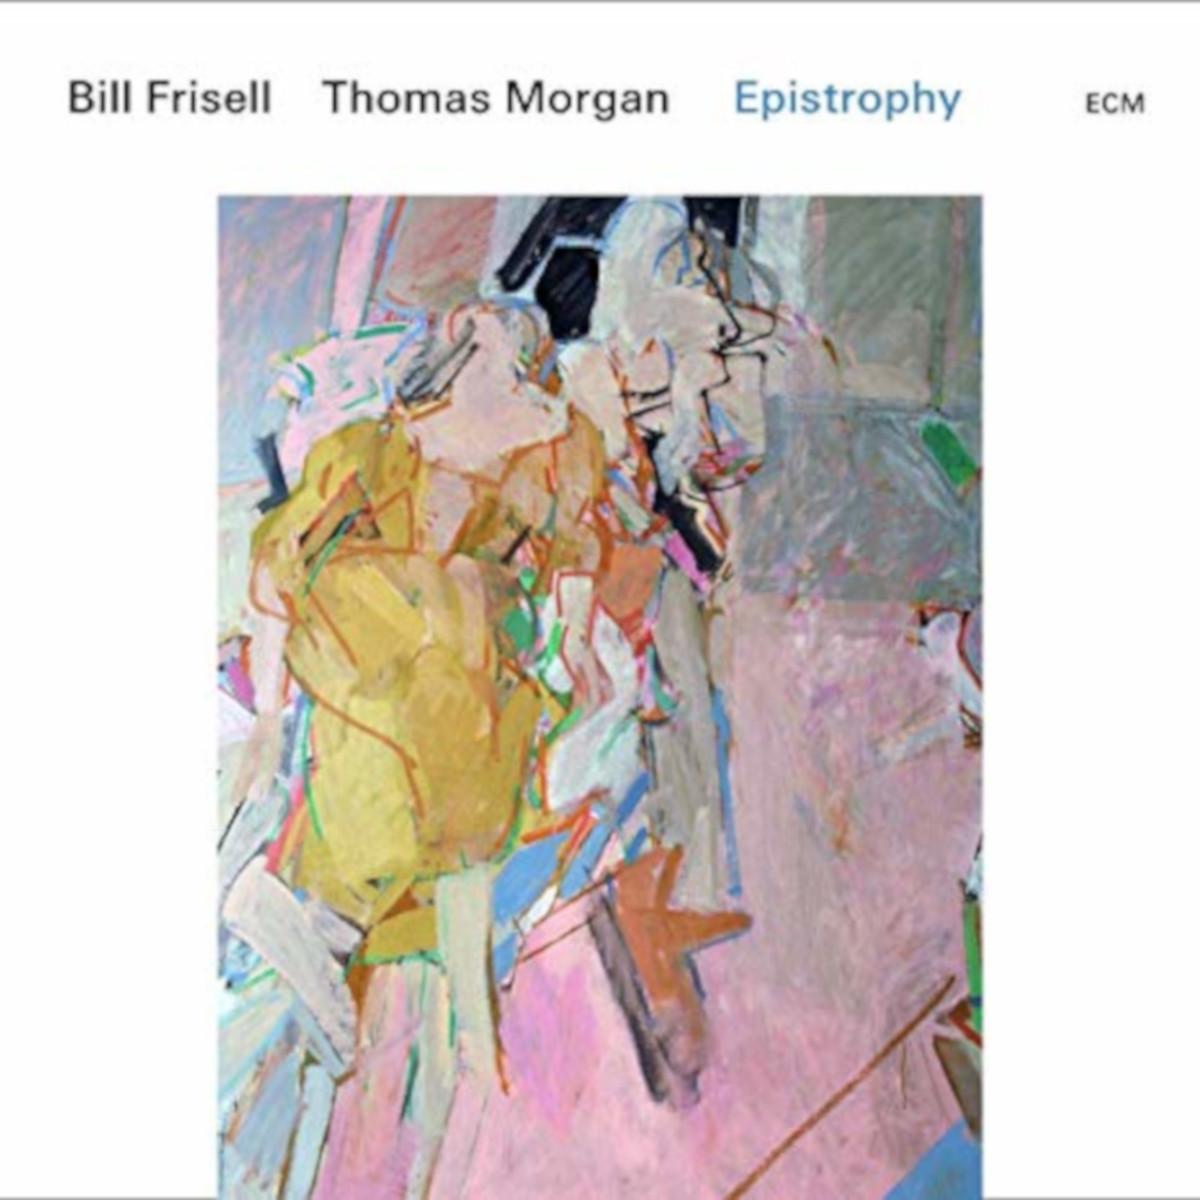 Bill Frisell, Thomas Morgan <br/> Epistrophy <br/> ECM, 2019